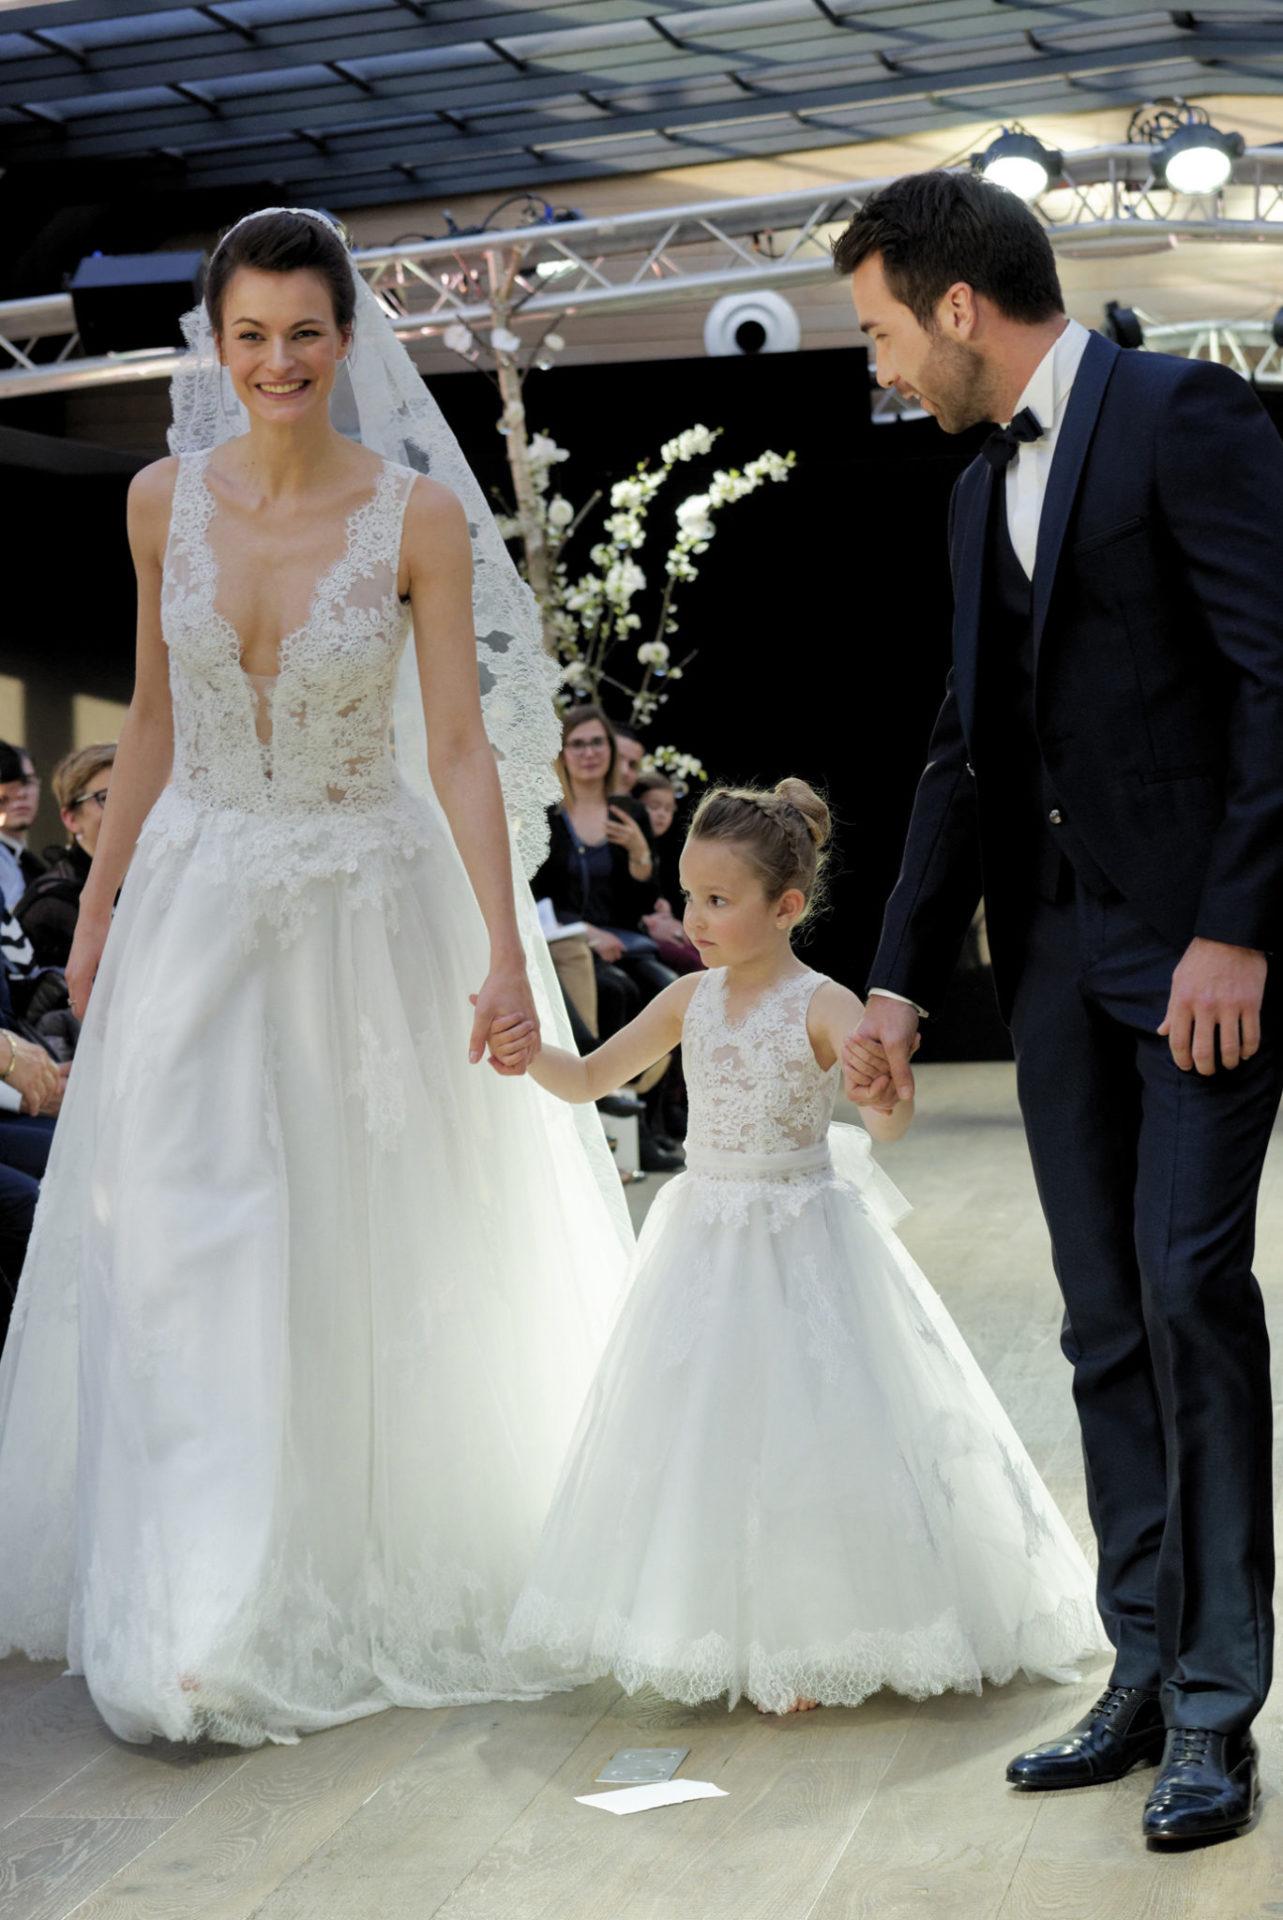 Robe mariage enfant - Robe de ceremonie fille - Robe cortège enfant Chocolat Cymbeline